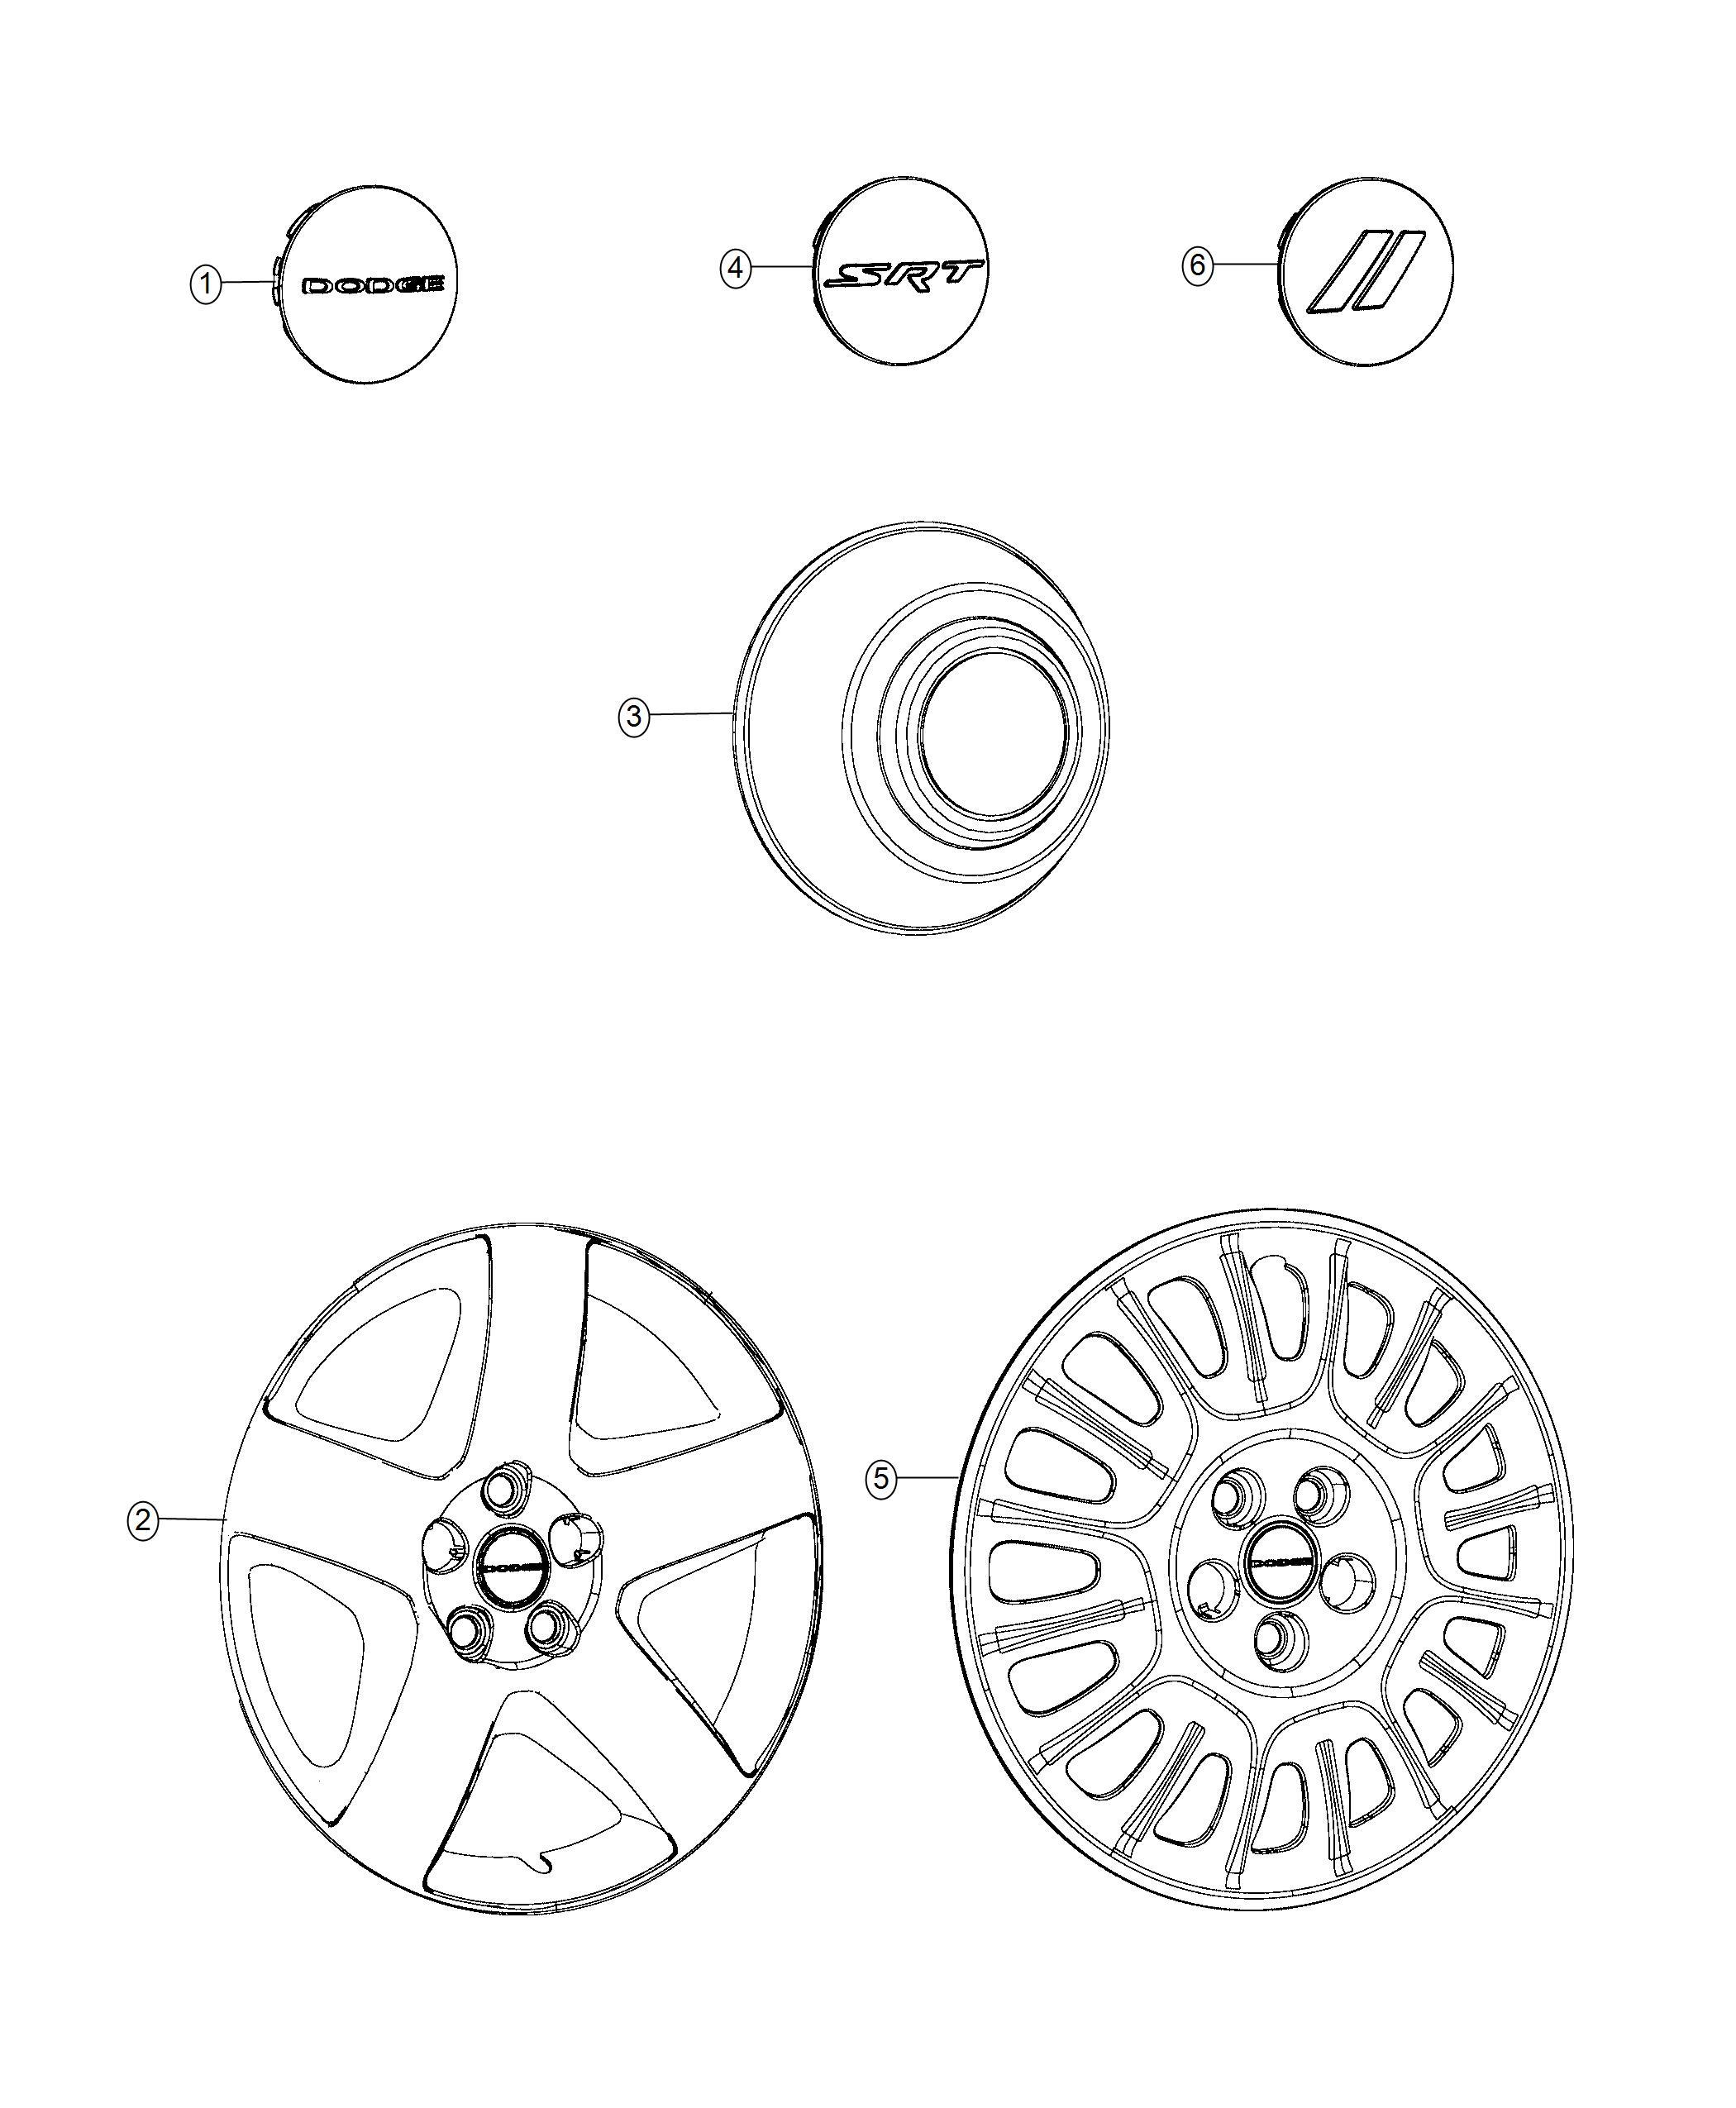 Dodge Charger Cover Wheel No Description Available